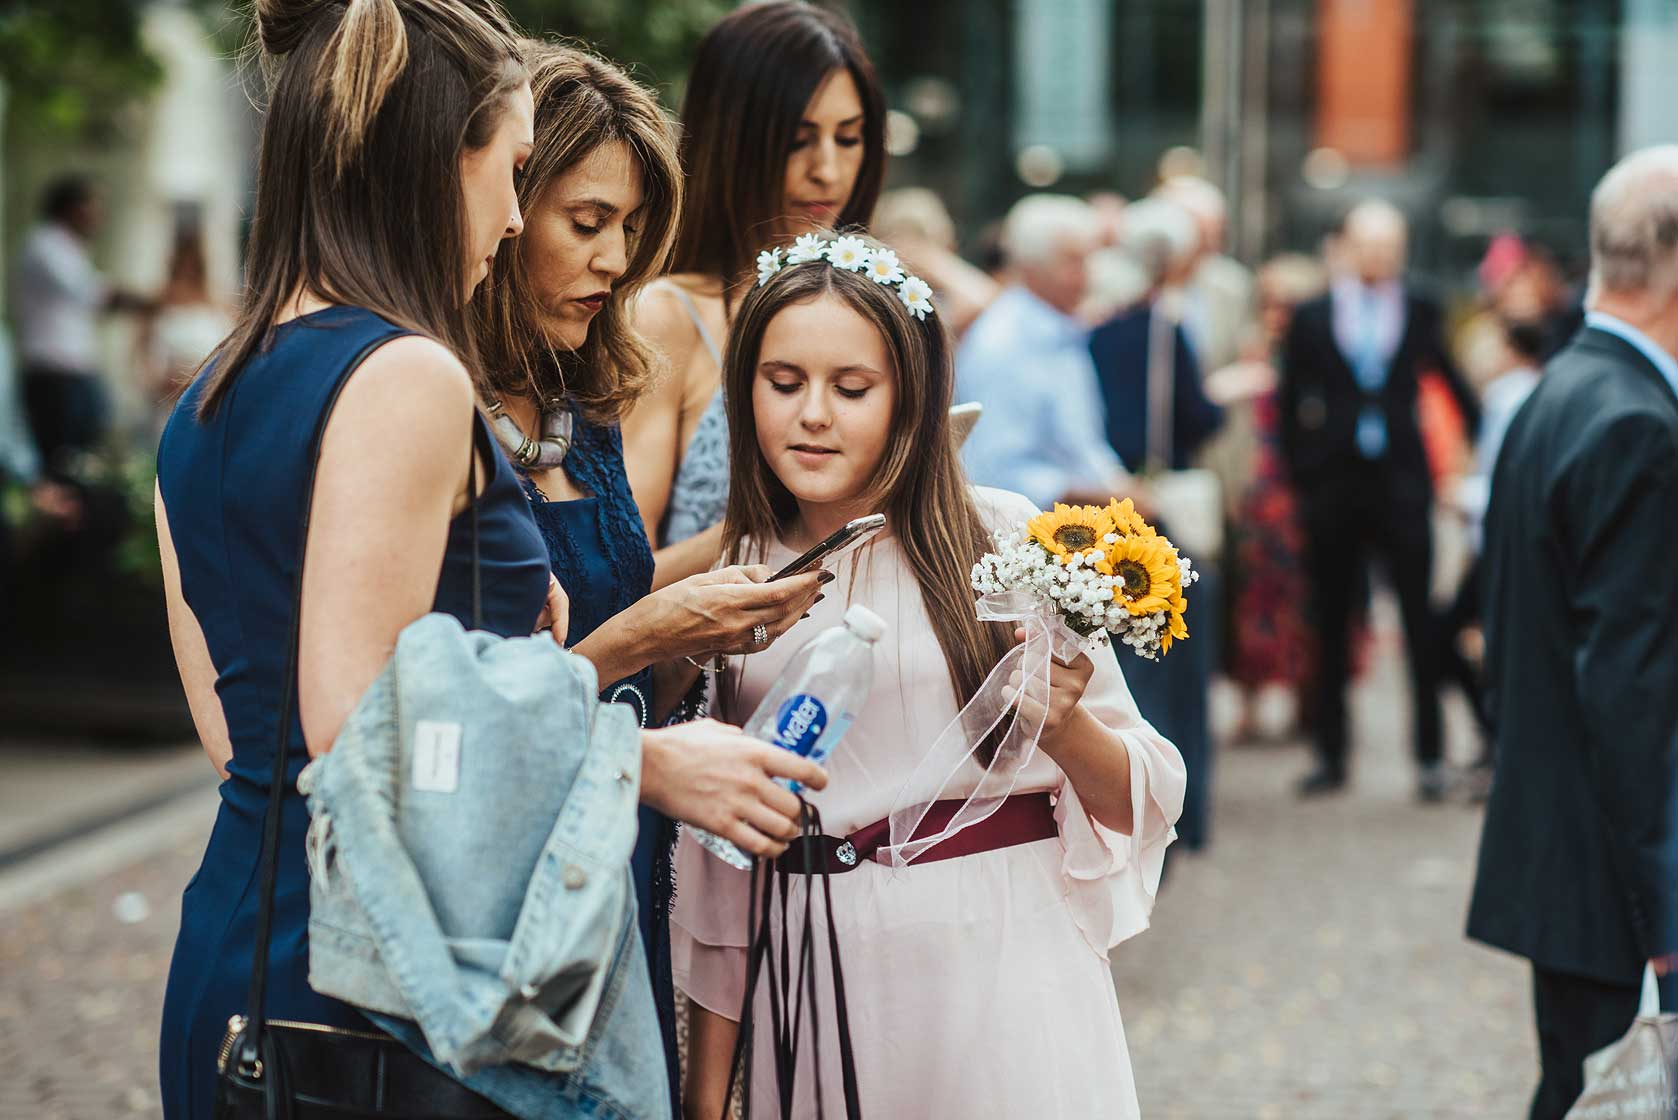 Wedding Photographer at Hackney Town Hall